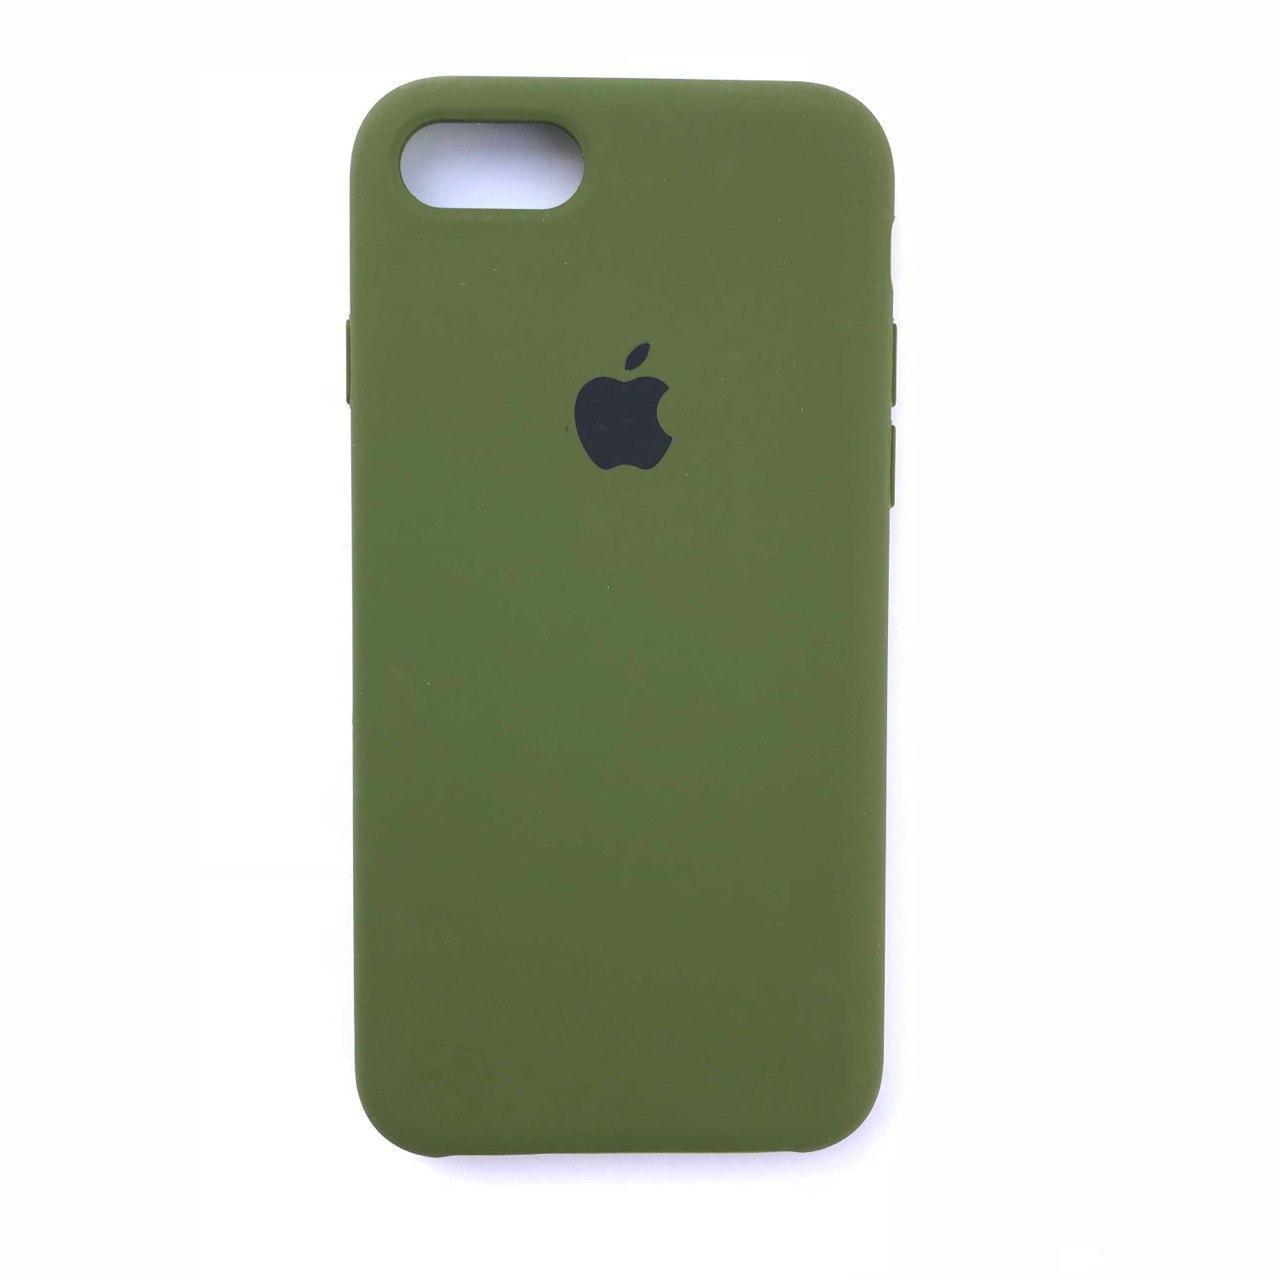 Чехол-накладка Silicone Case для Apple iPhone 7 iPhone 8 Pinery Green